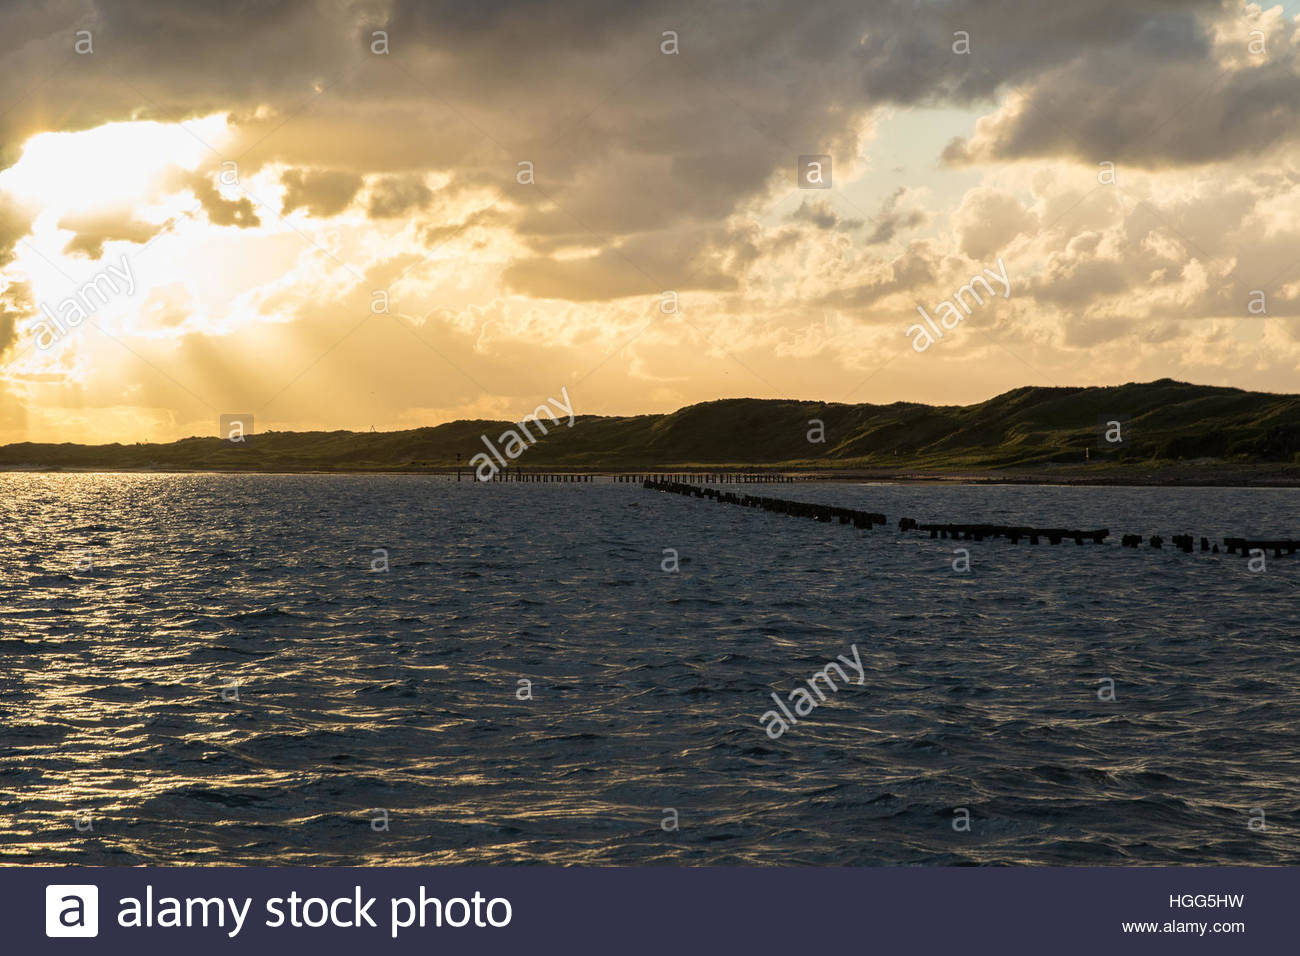 former ostanleger, wangerooge, friesland district, lower saxony, north sea, germany, june 2016 Stock Photo